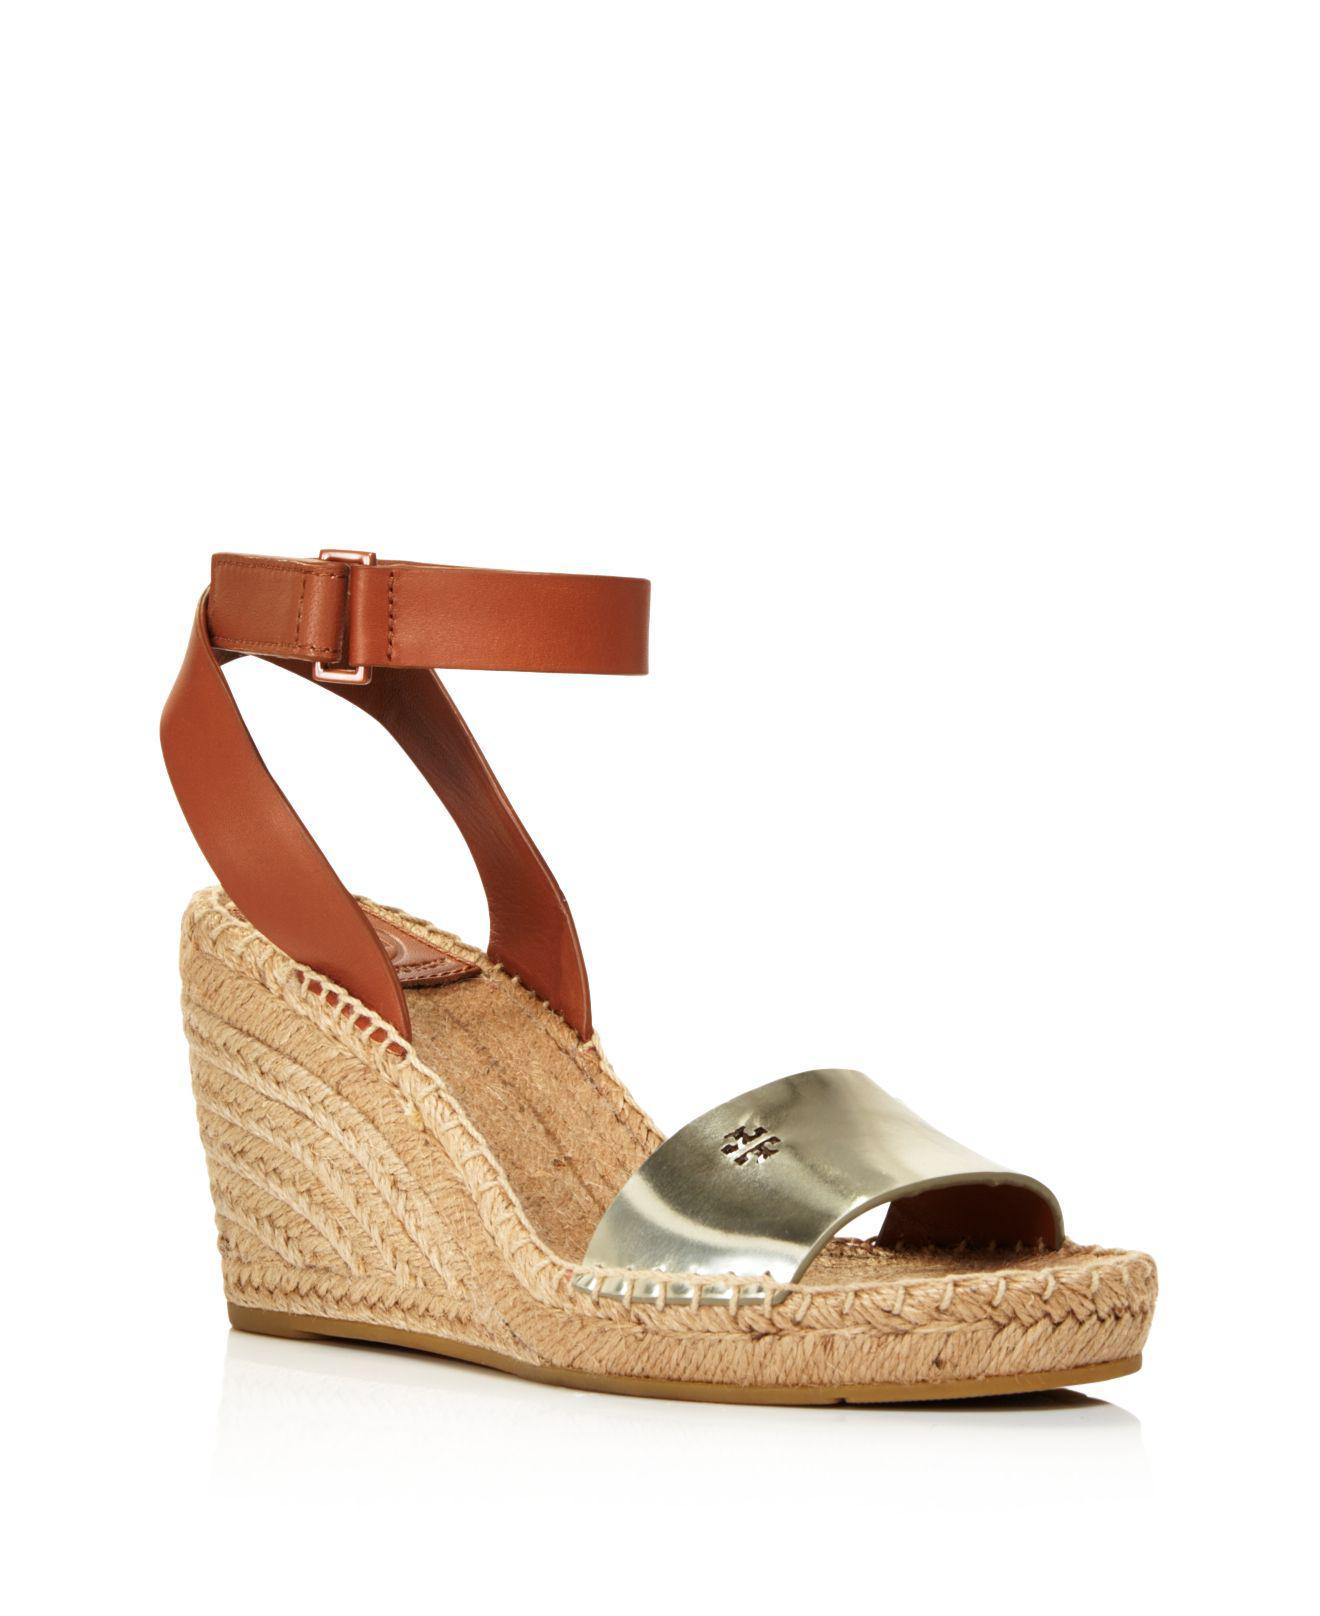 Tory Burch. Women's Bima Espadrille Platform Wedge Sandals